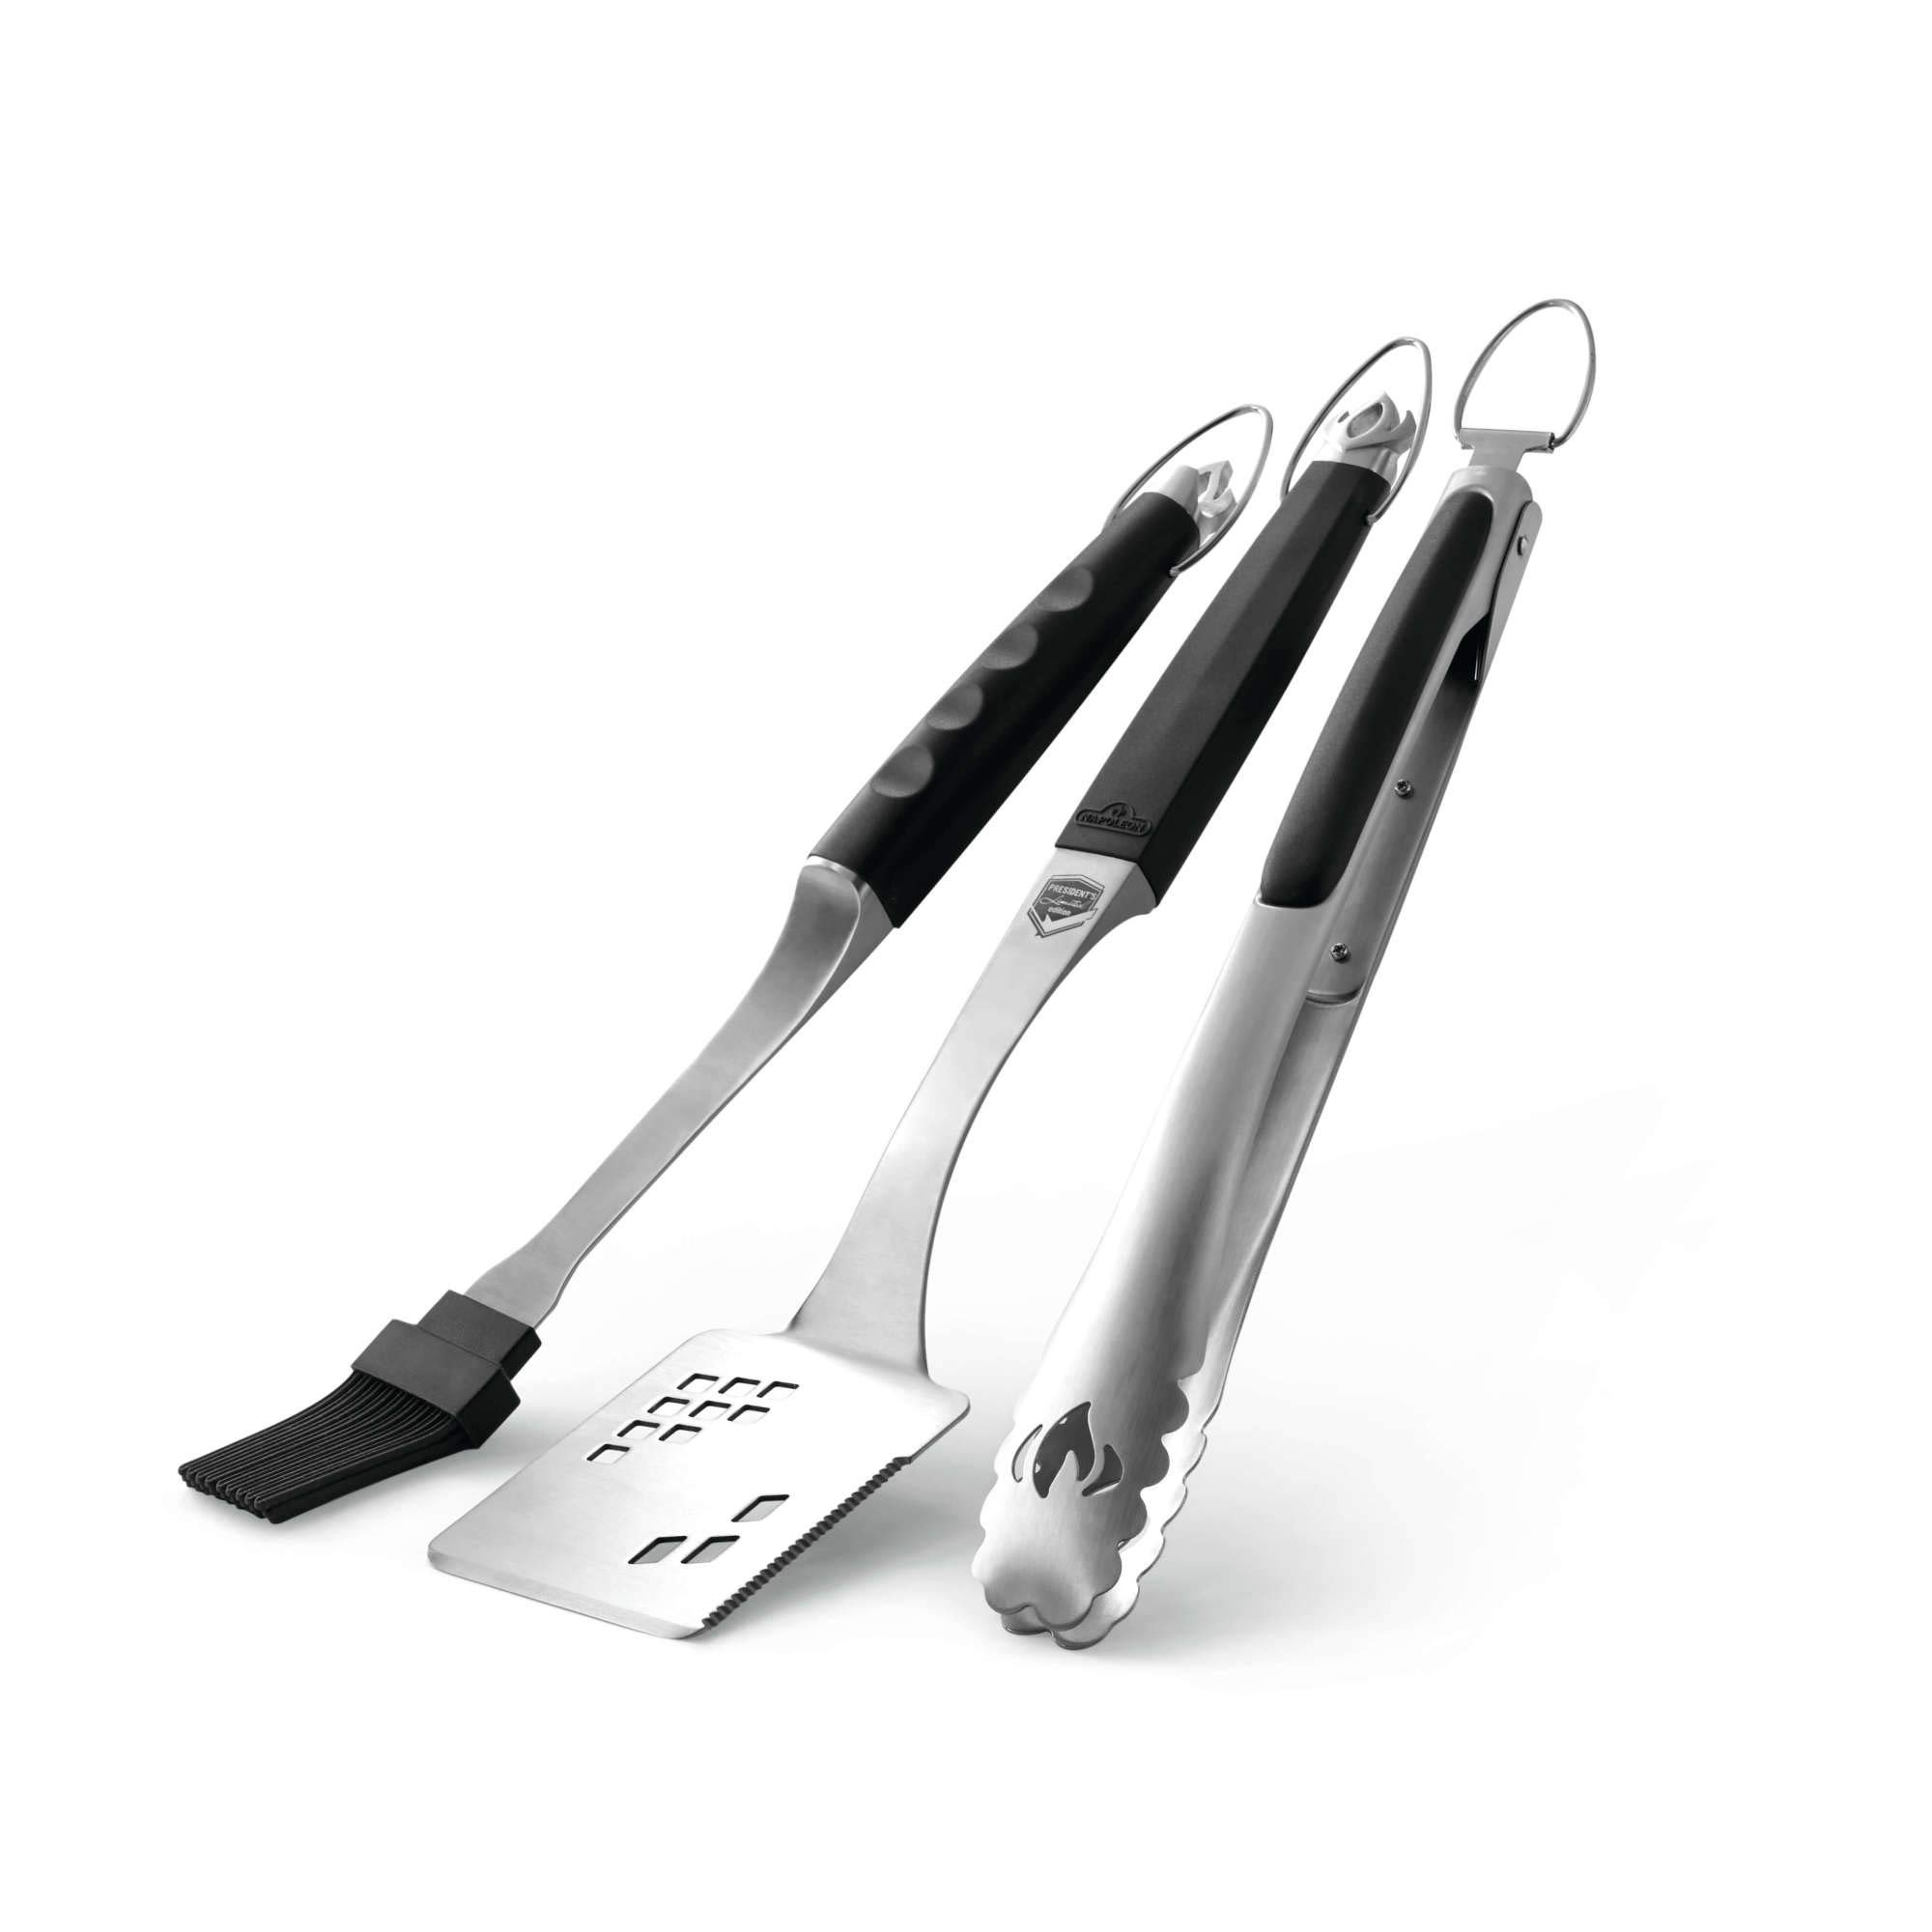 Napoleon 70036 Executive 3 Piece Toolset Grill Tool Set, Multi